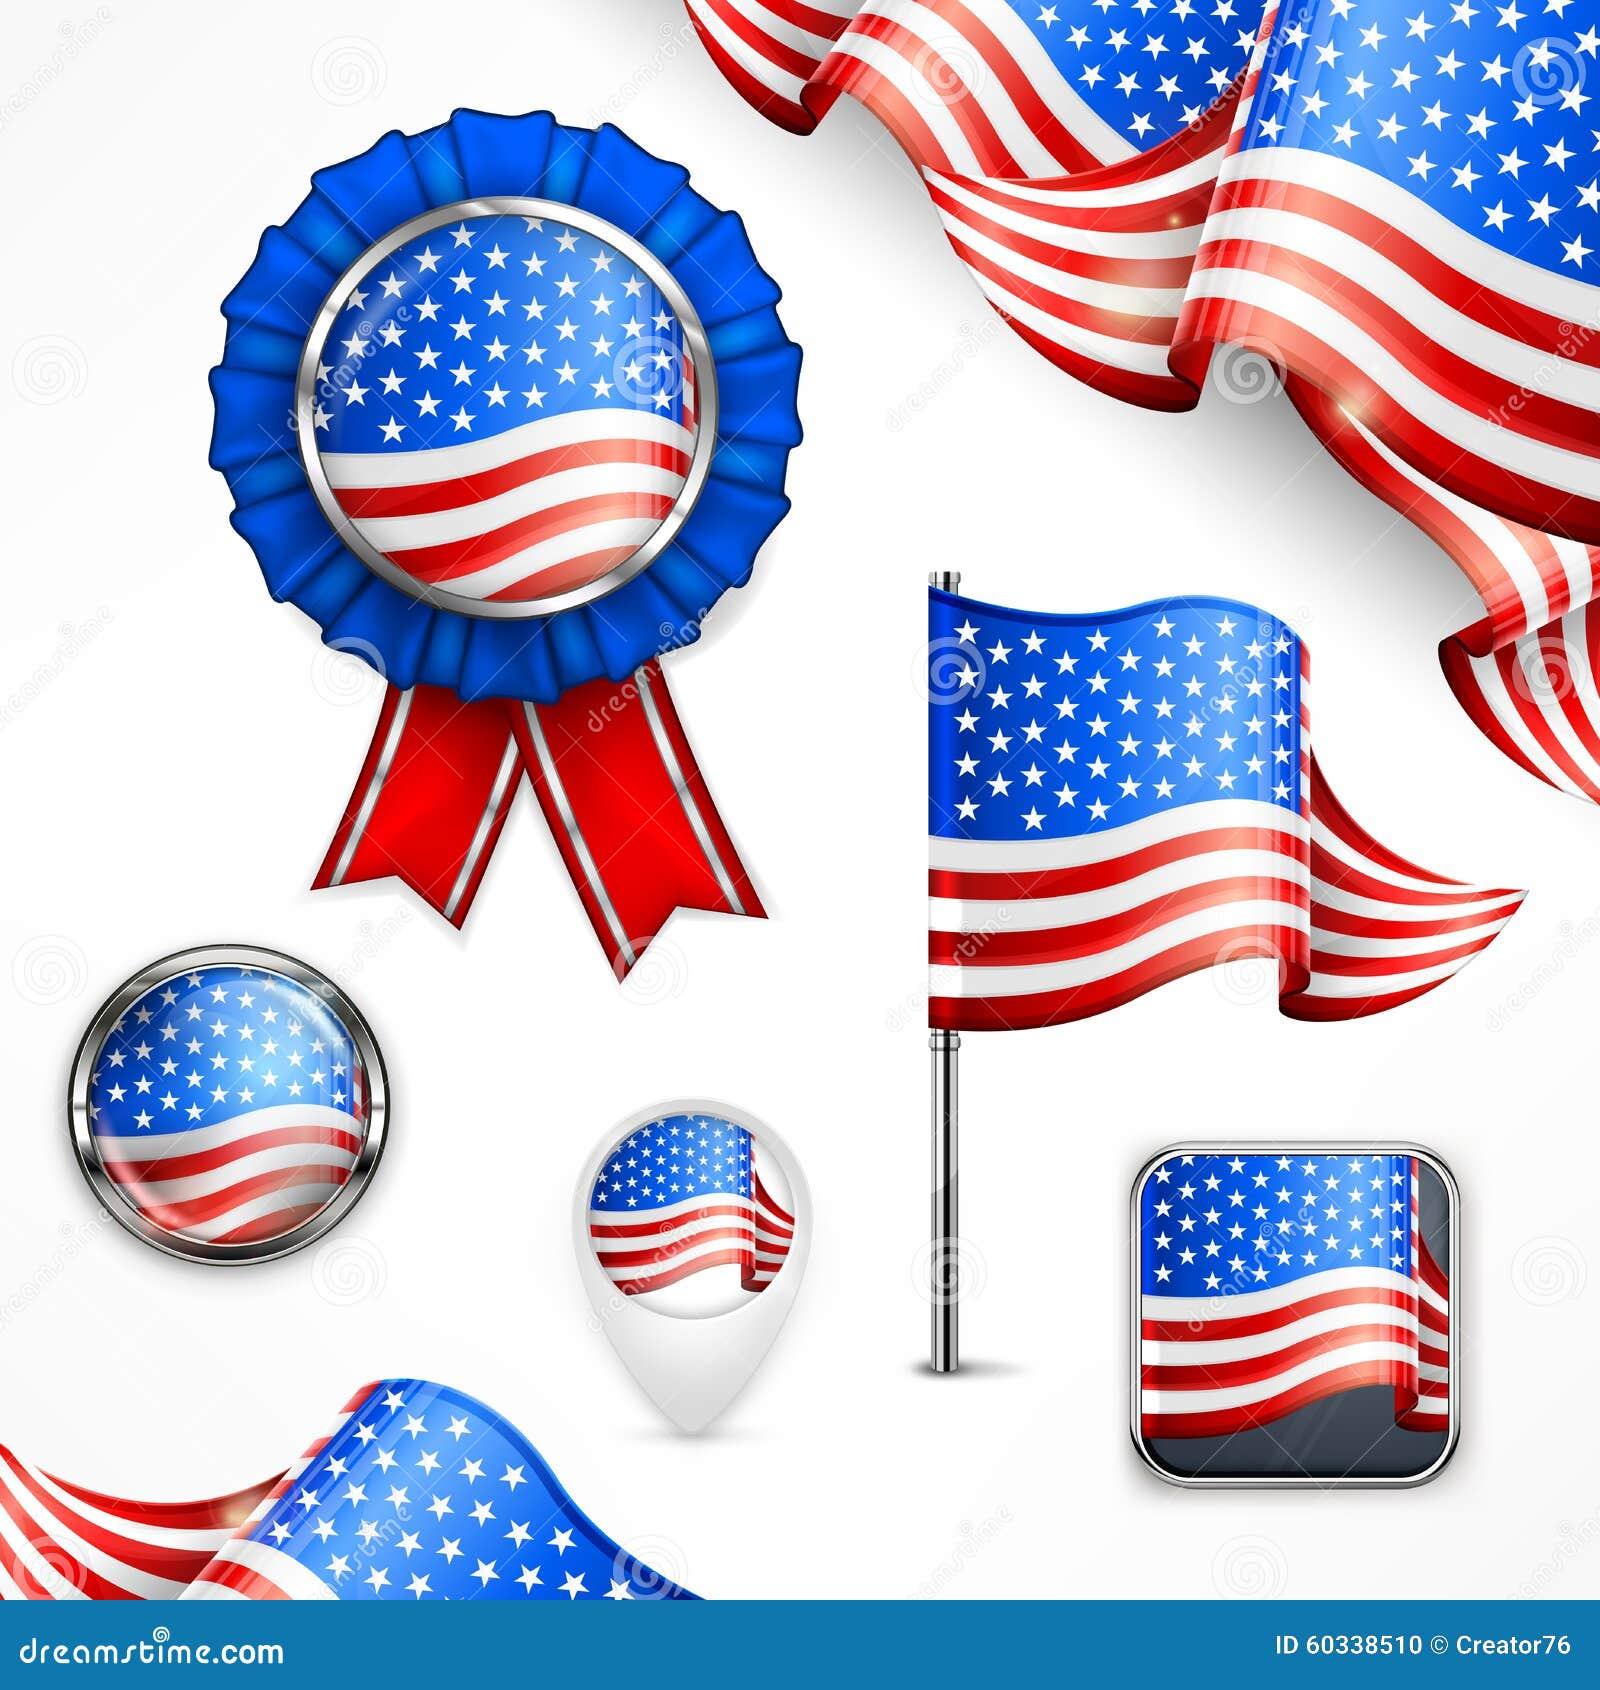 National symbols of the United States - Wikipedia